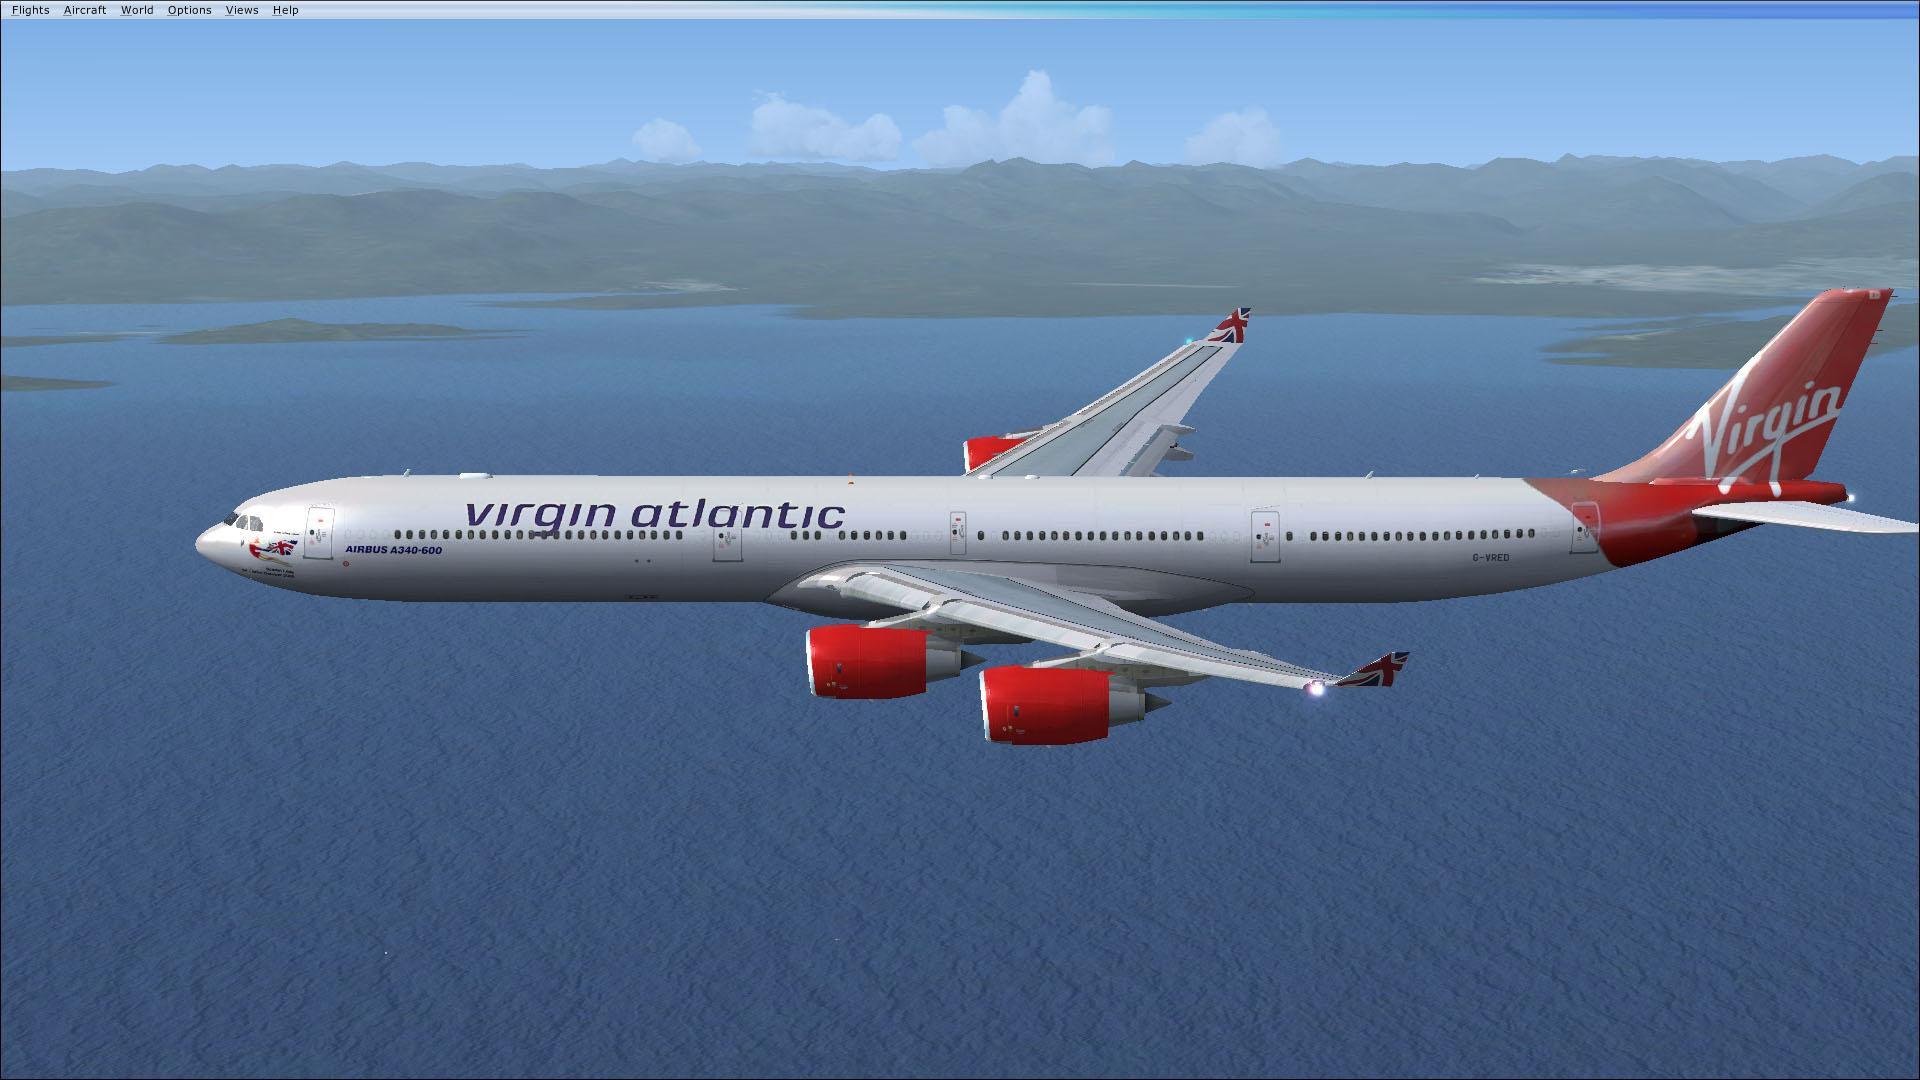 Fsx Wallpaper Hd Virgin Atlantic Airways Airbus A340 600 G Vred For Fsx